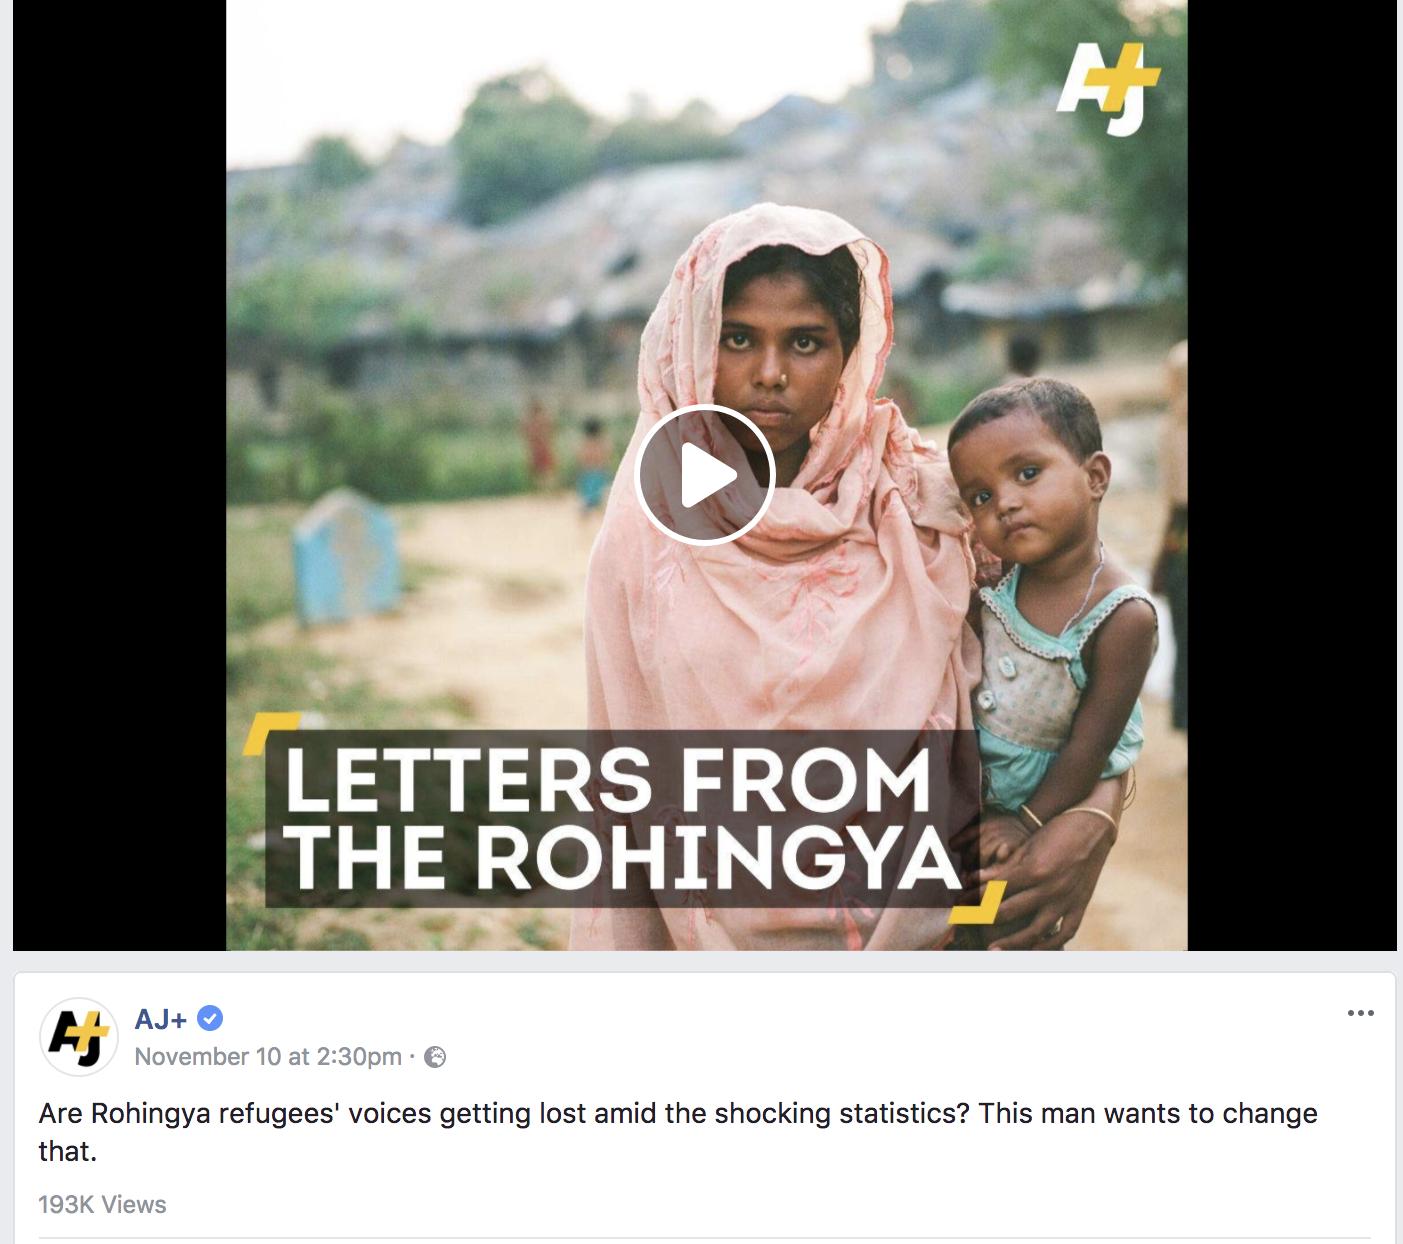 Al Jazeera+ video, Nov. 2017